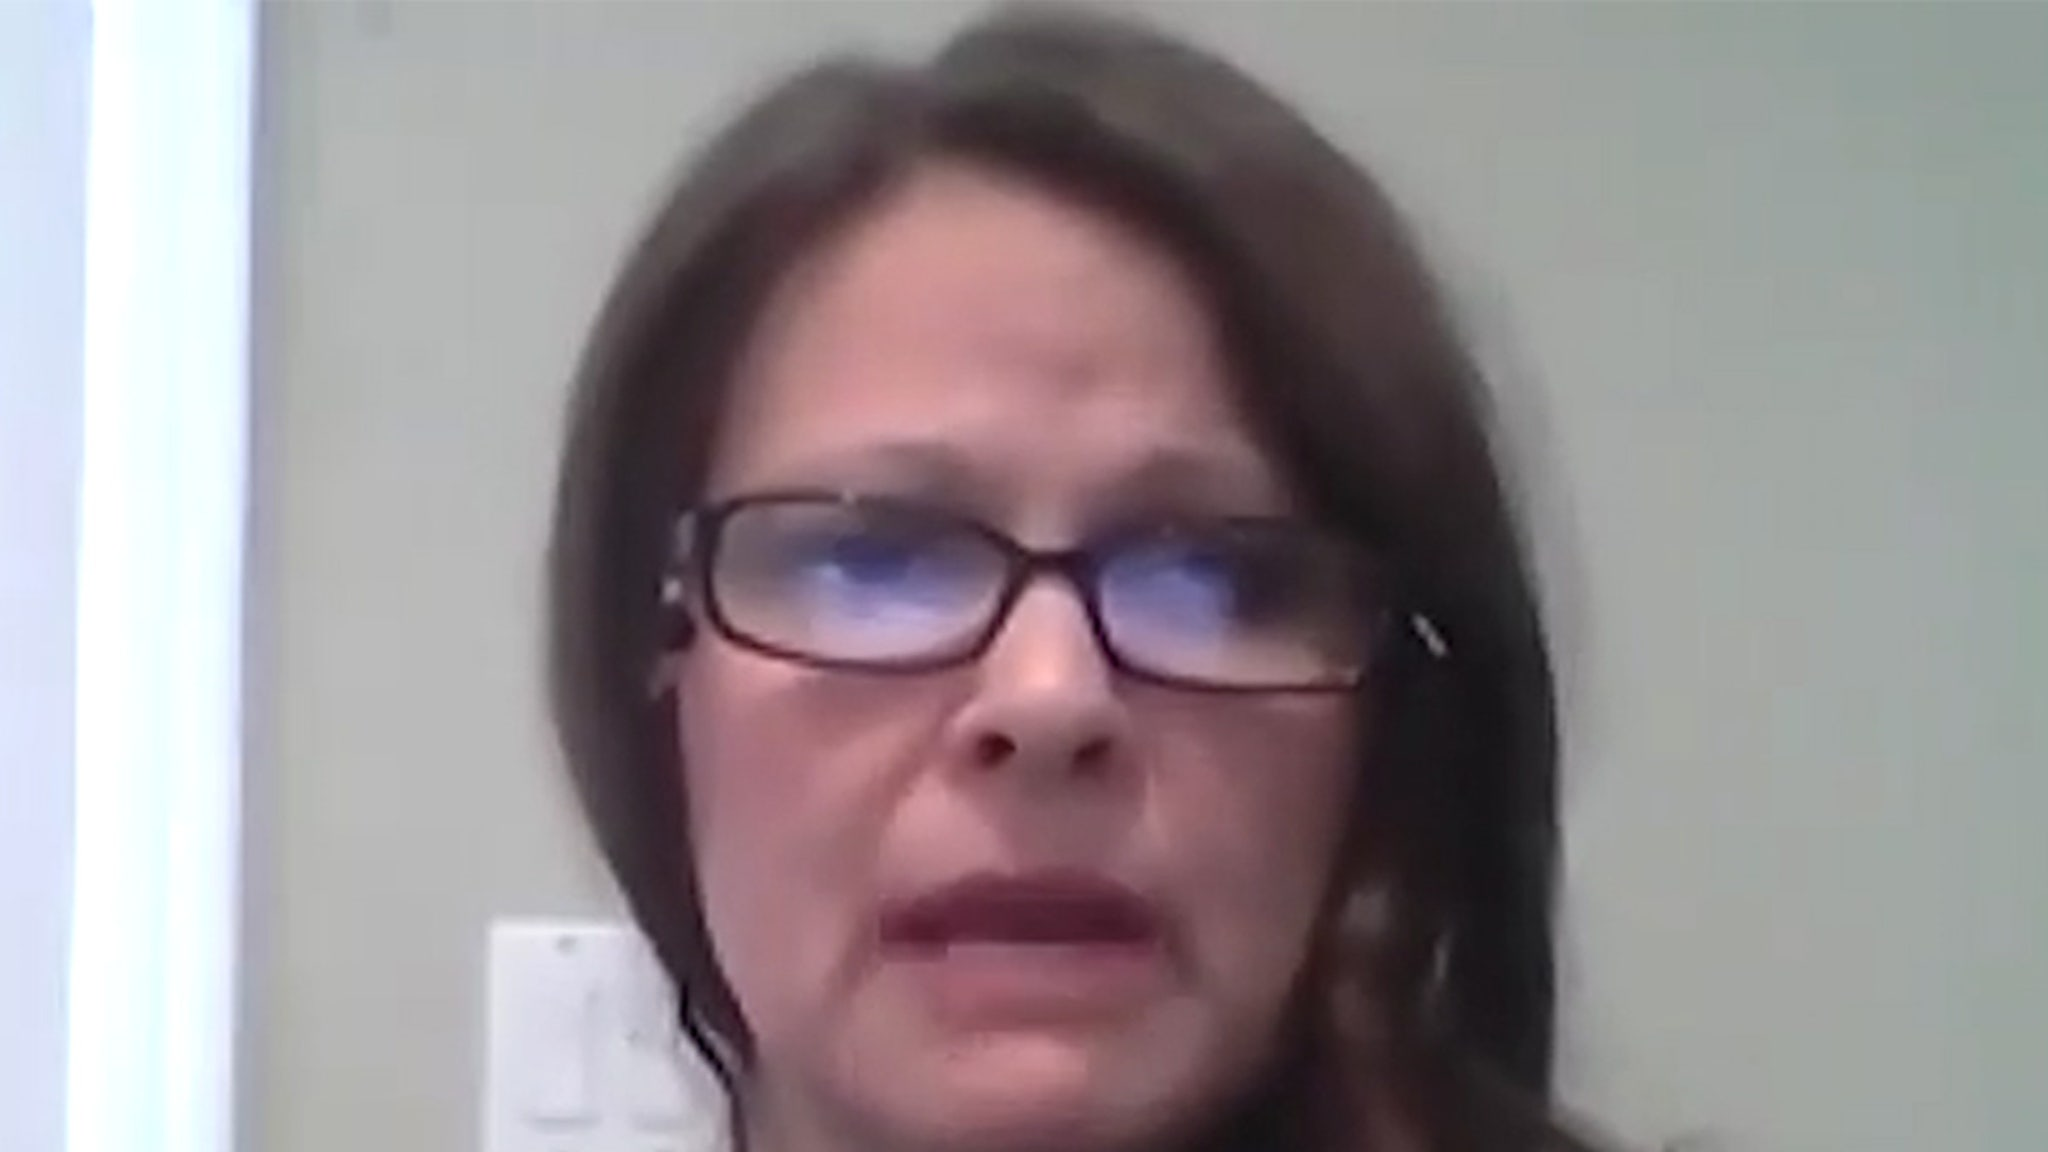 Dana Stubblefield My Husband Is Innocent ... Had Sex w/ Accuser, But Wasn't Rape